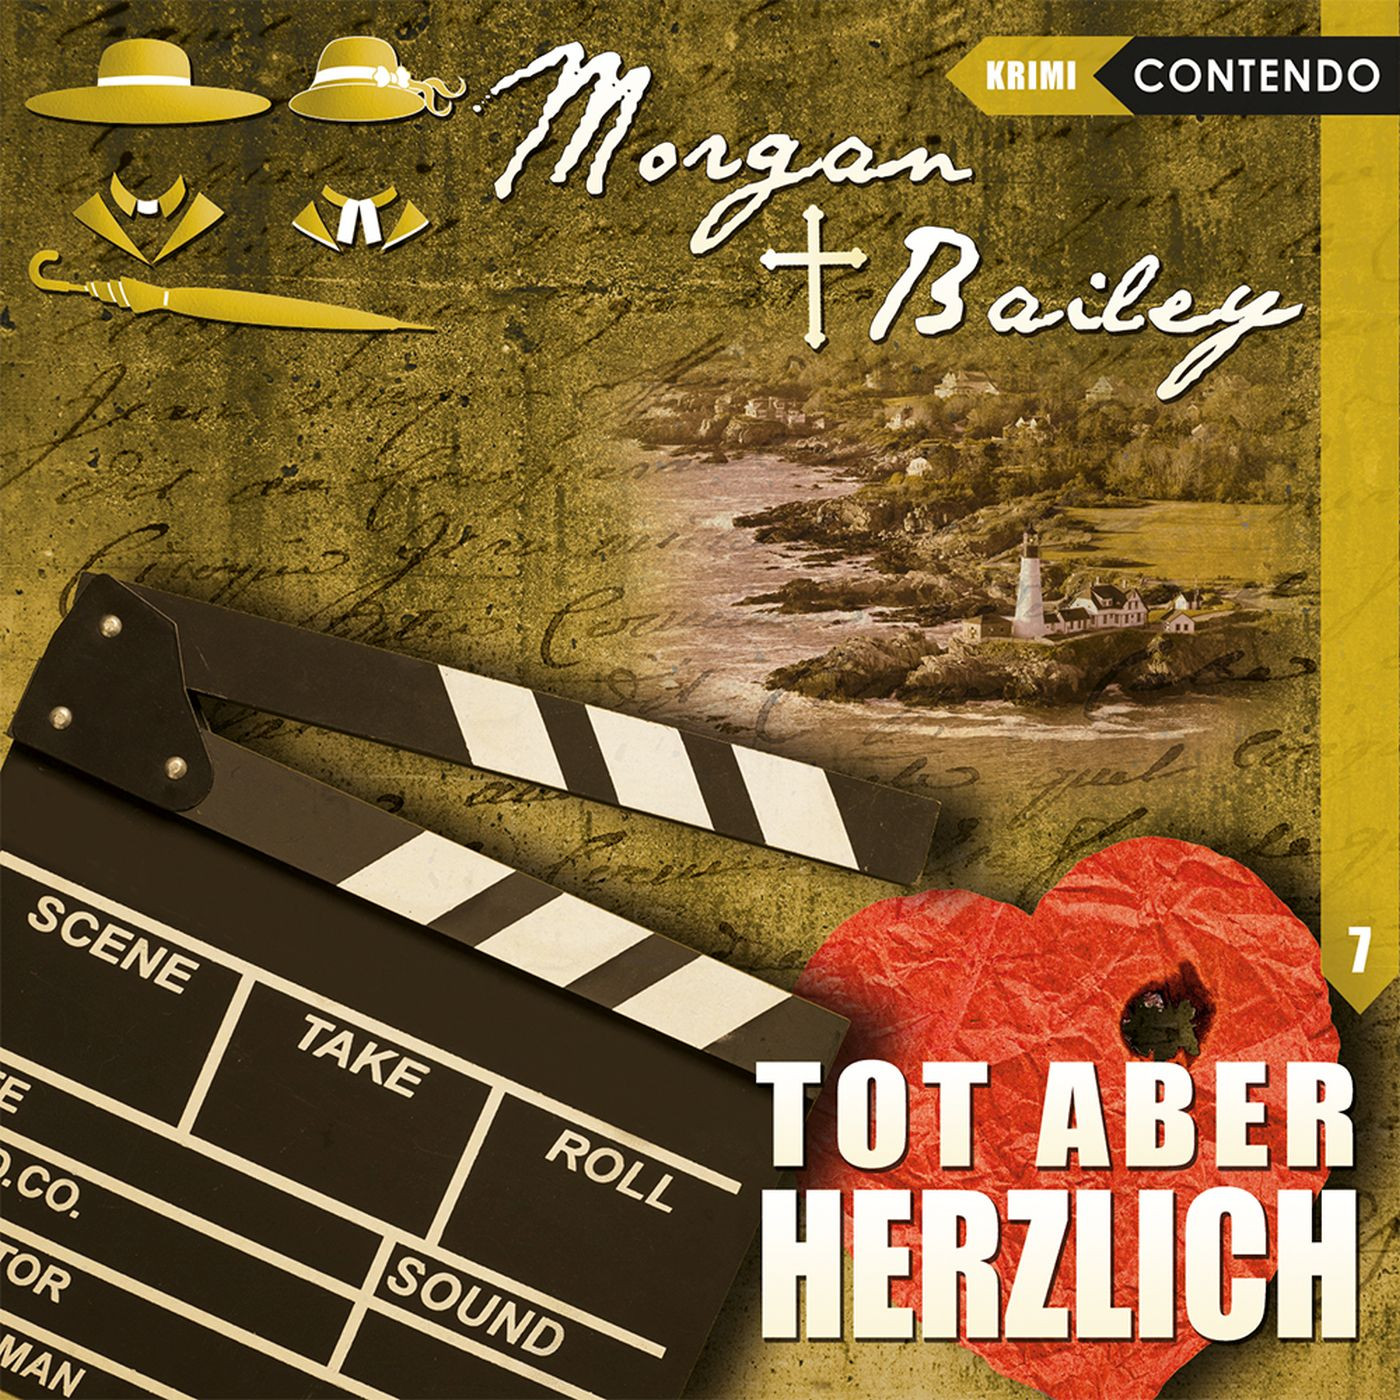 Morgan & Bailey - Folge 7: Tot aber herzlich